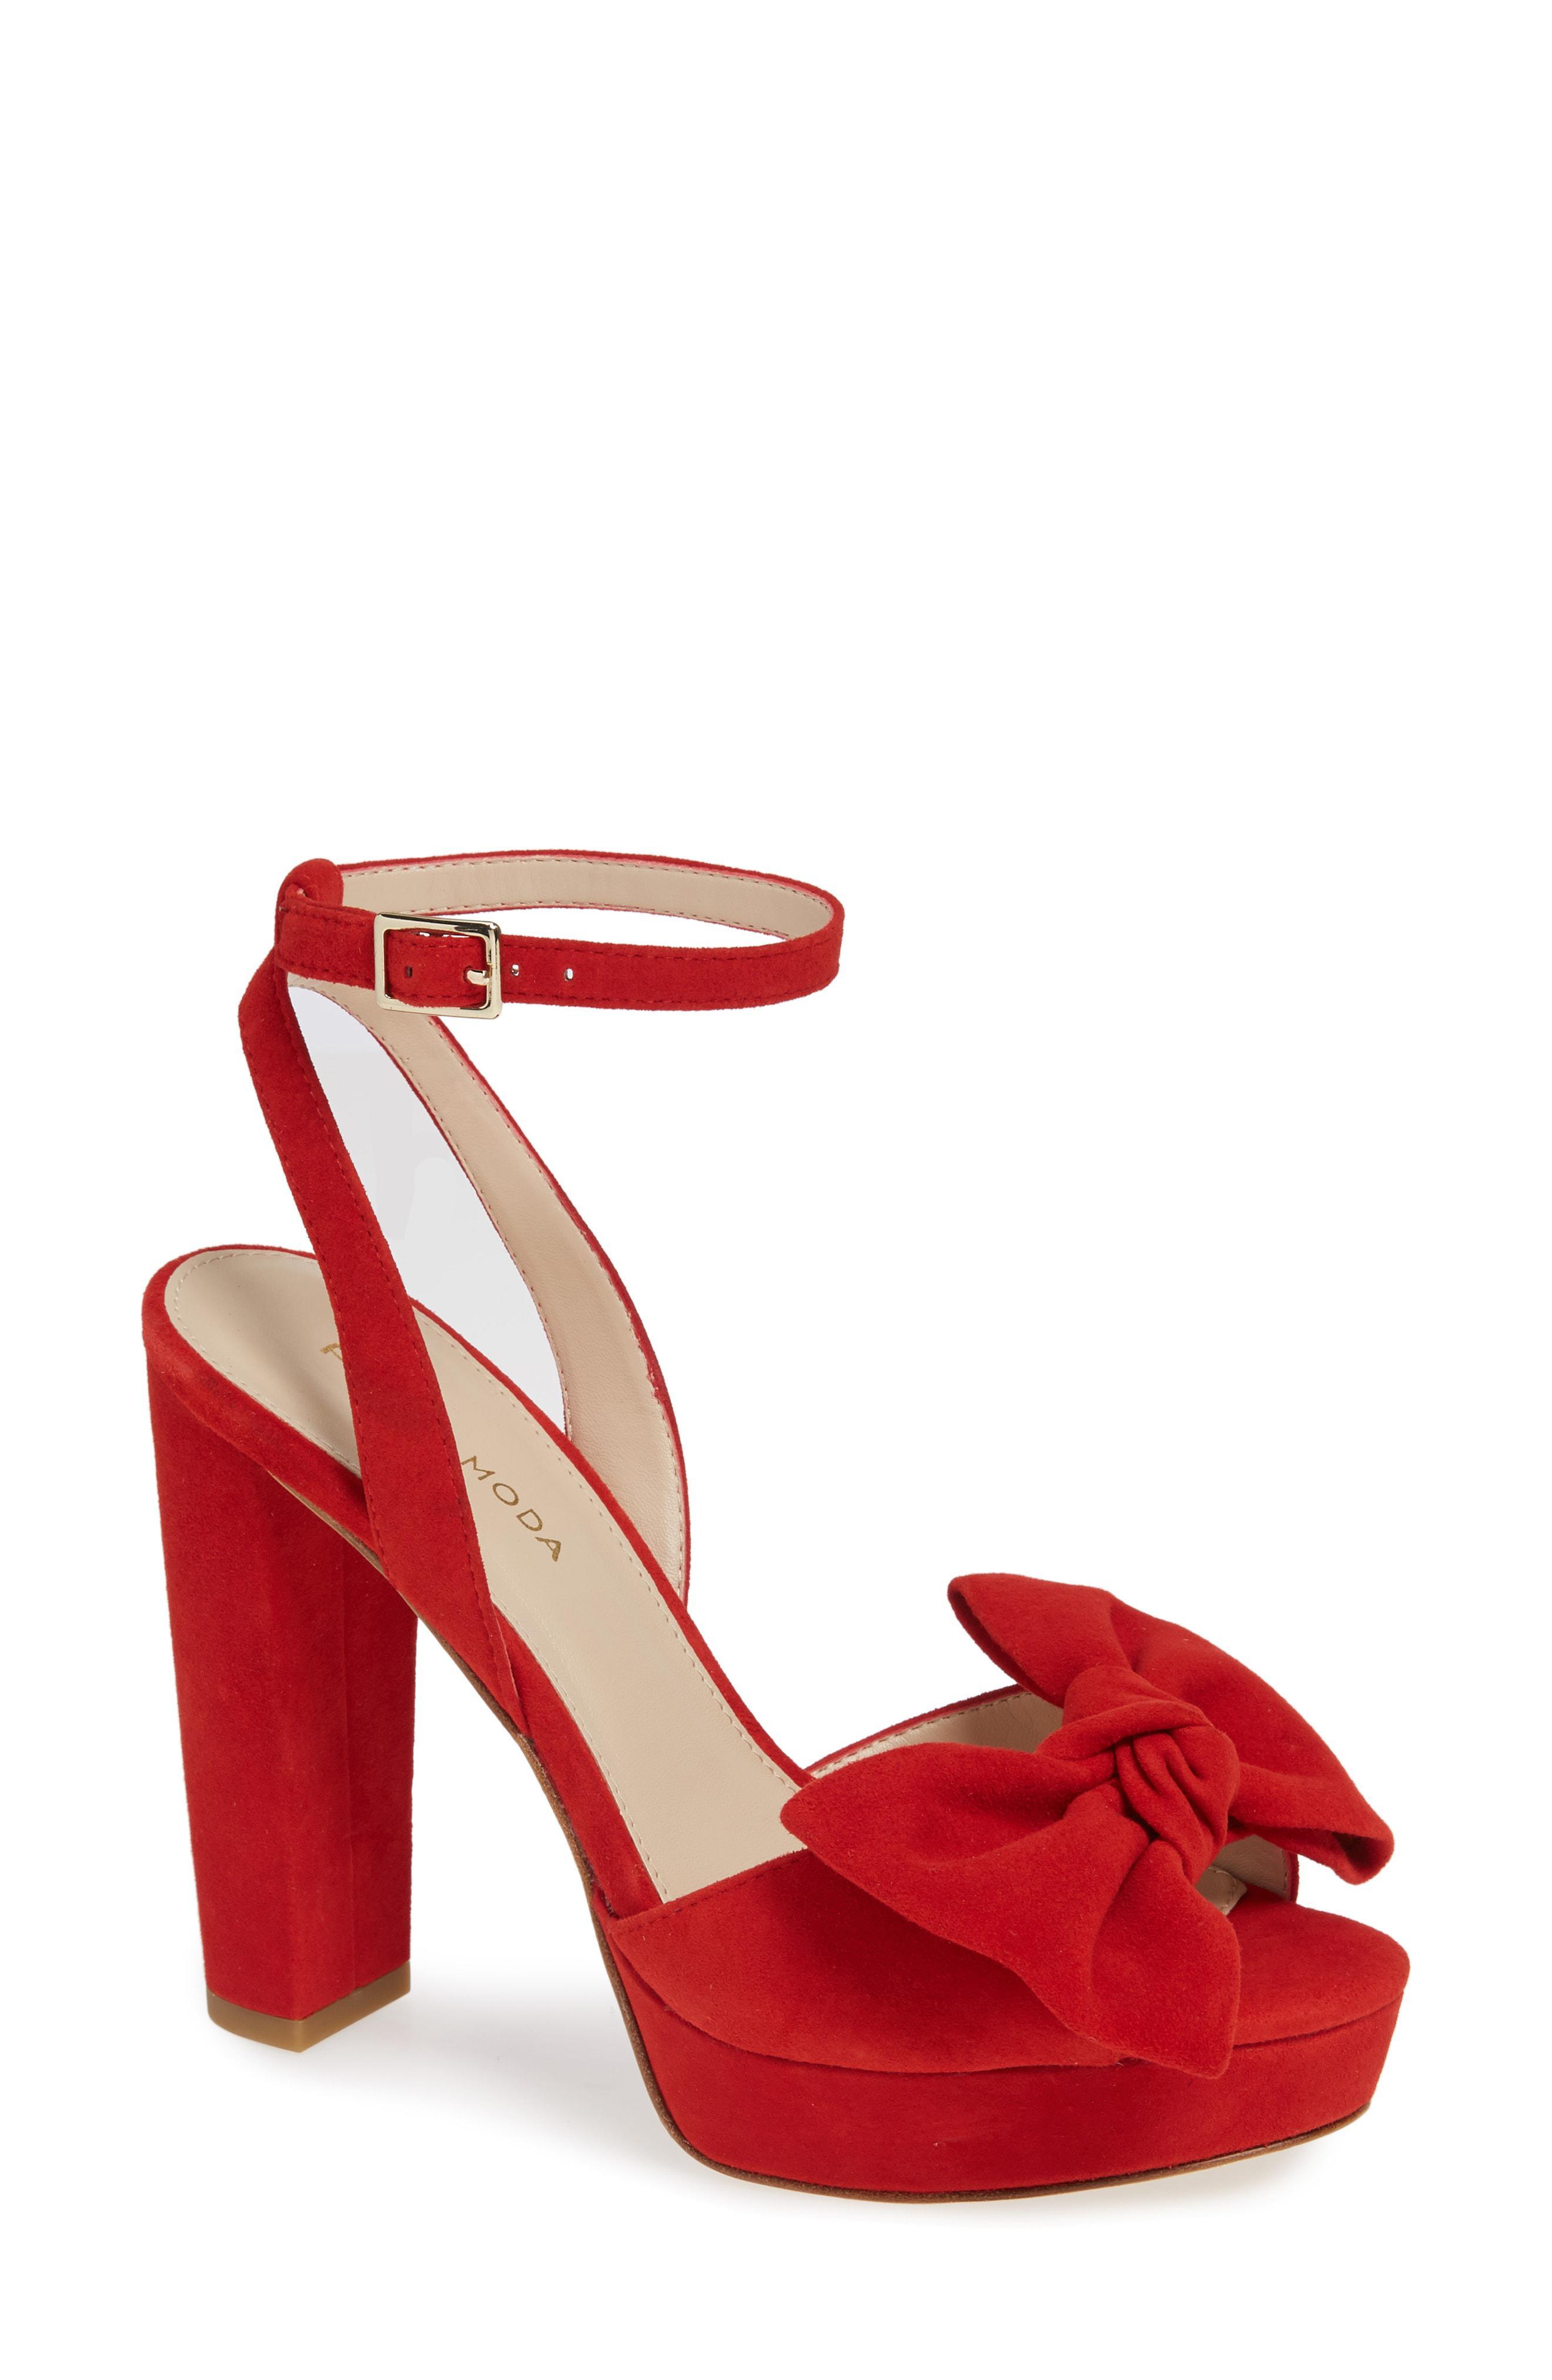 261b7d0b7a17 Lyst - Pelle Moda Platform Sandal in Red